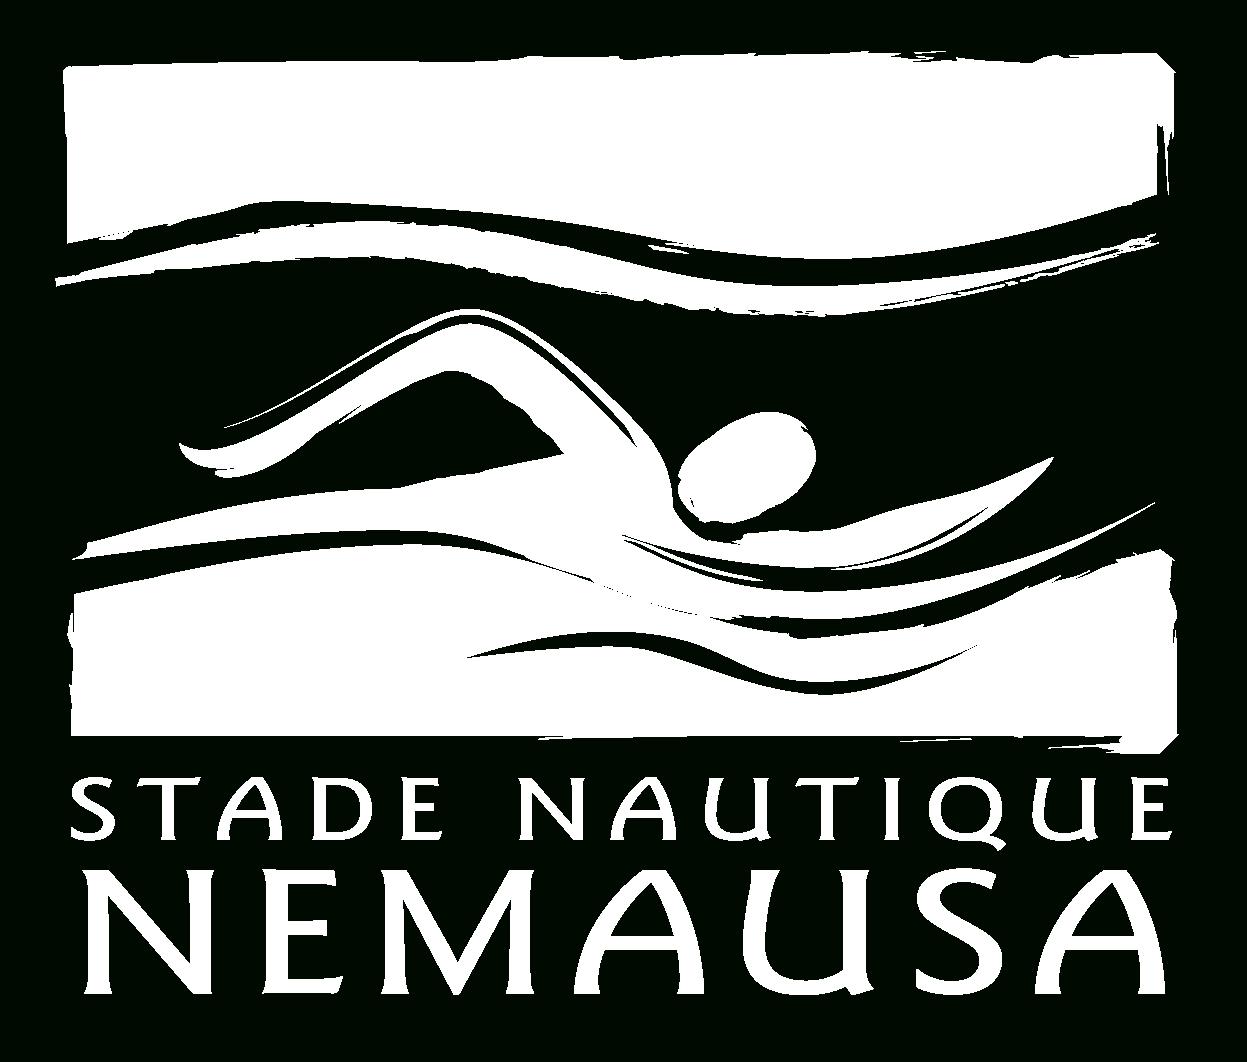 Némausa – Nîmes – Vert Marine – Le Grand Centre Aquatique De ... pour Piscine Nemausa Nimes